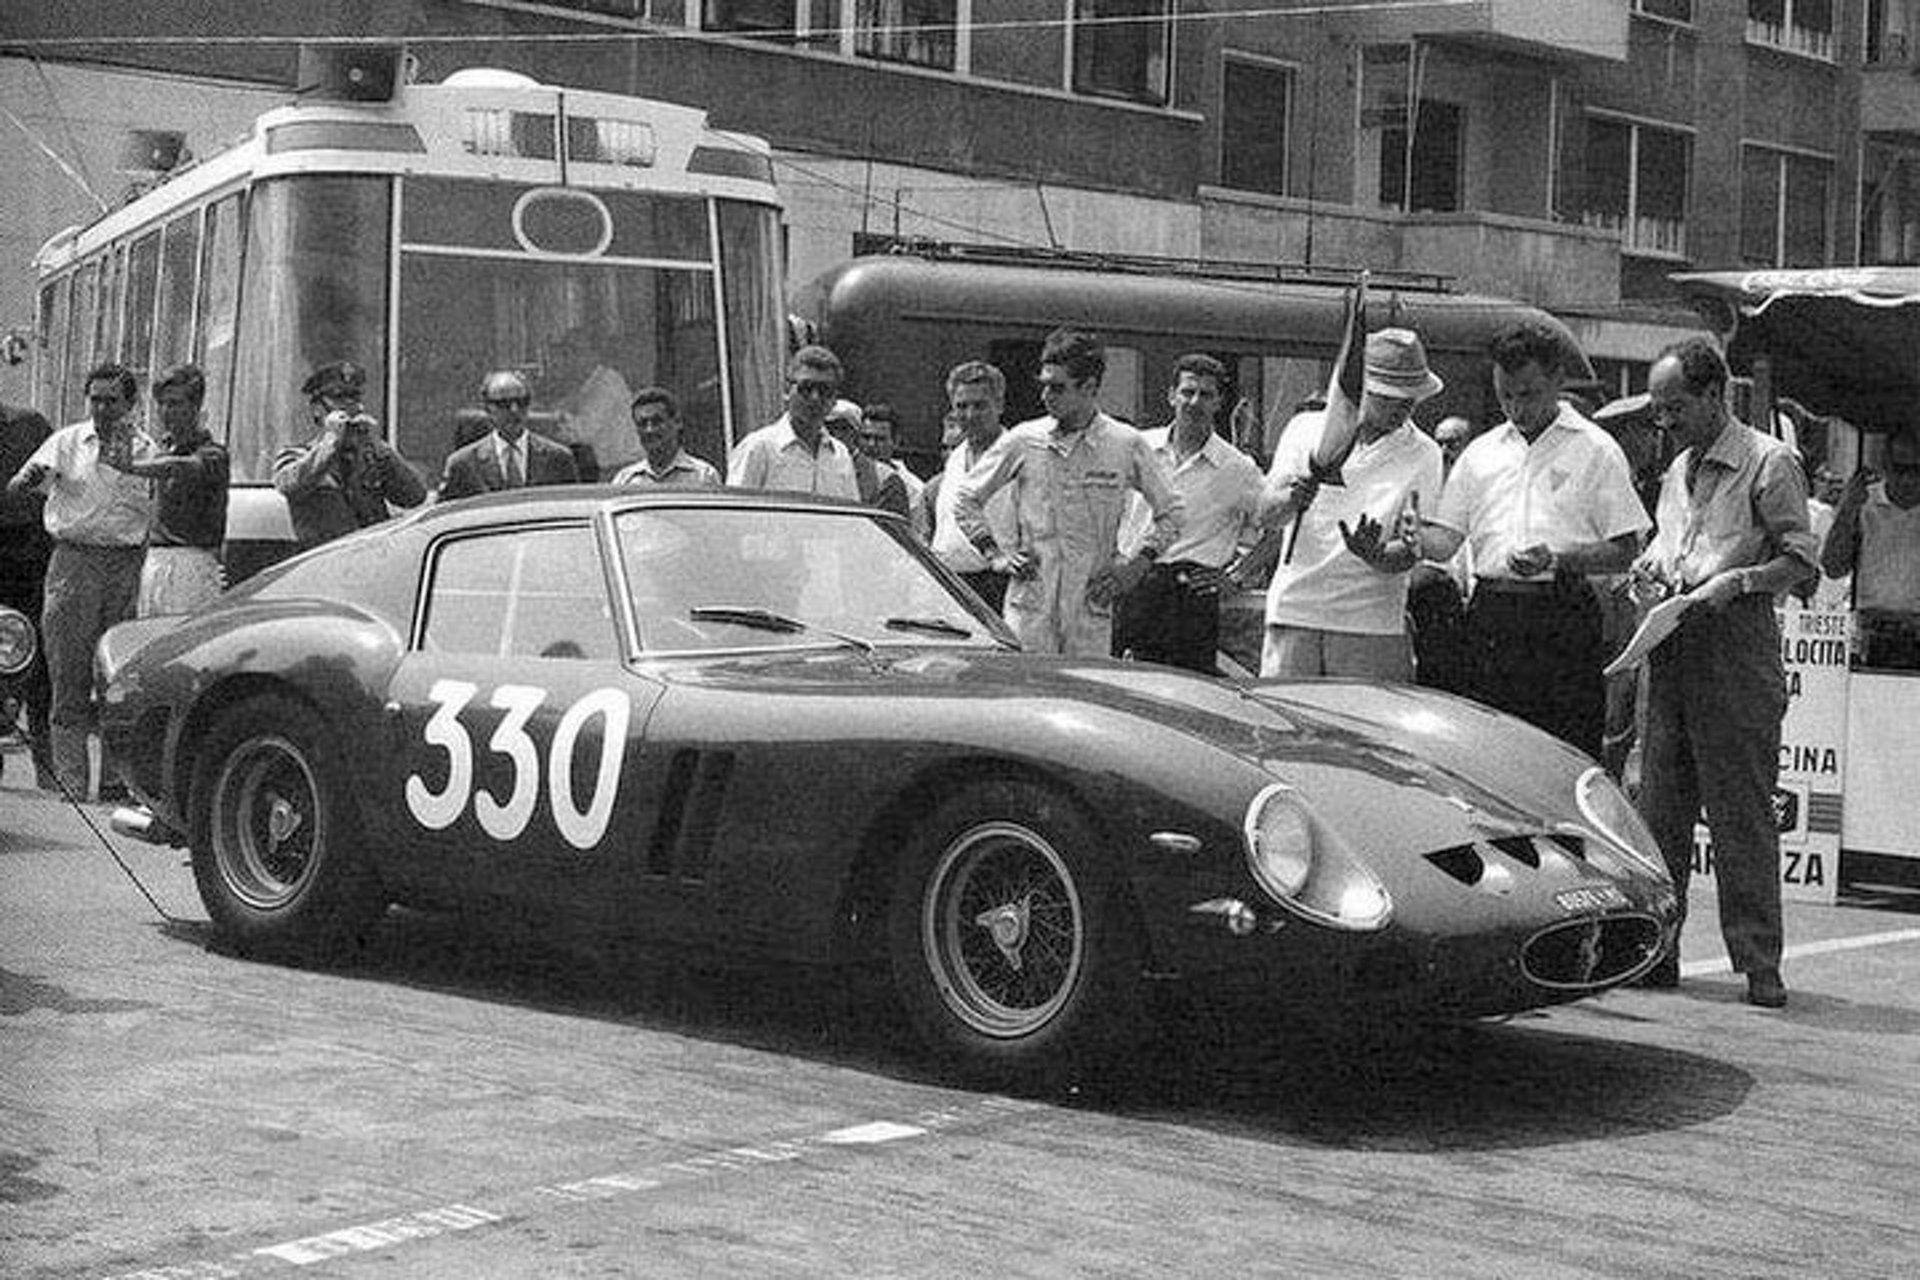 1962 Ferrari 250 GTO Sells for a Record-Setting $38 Million